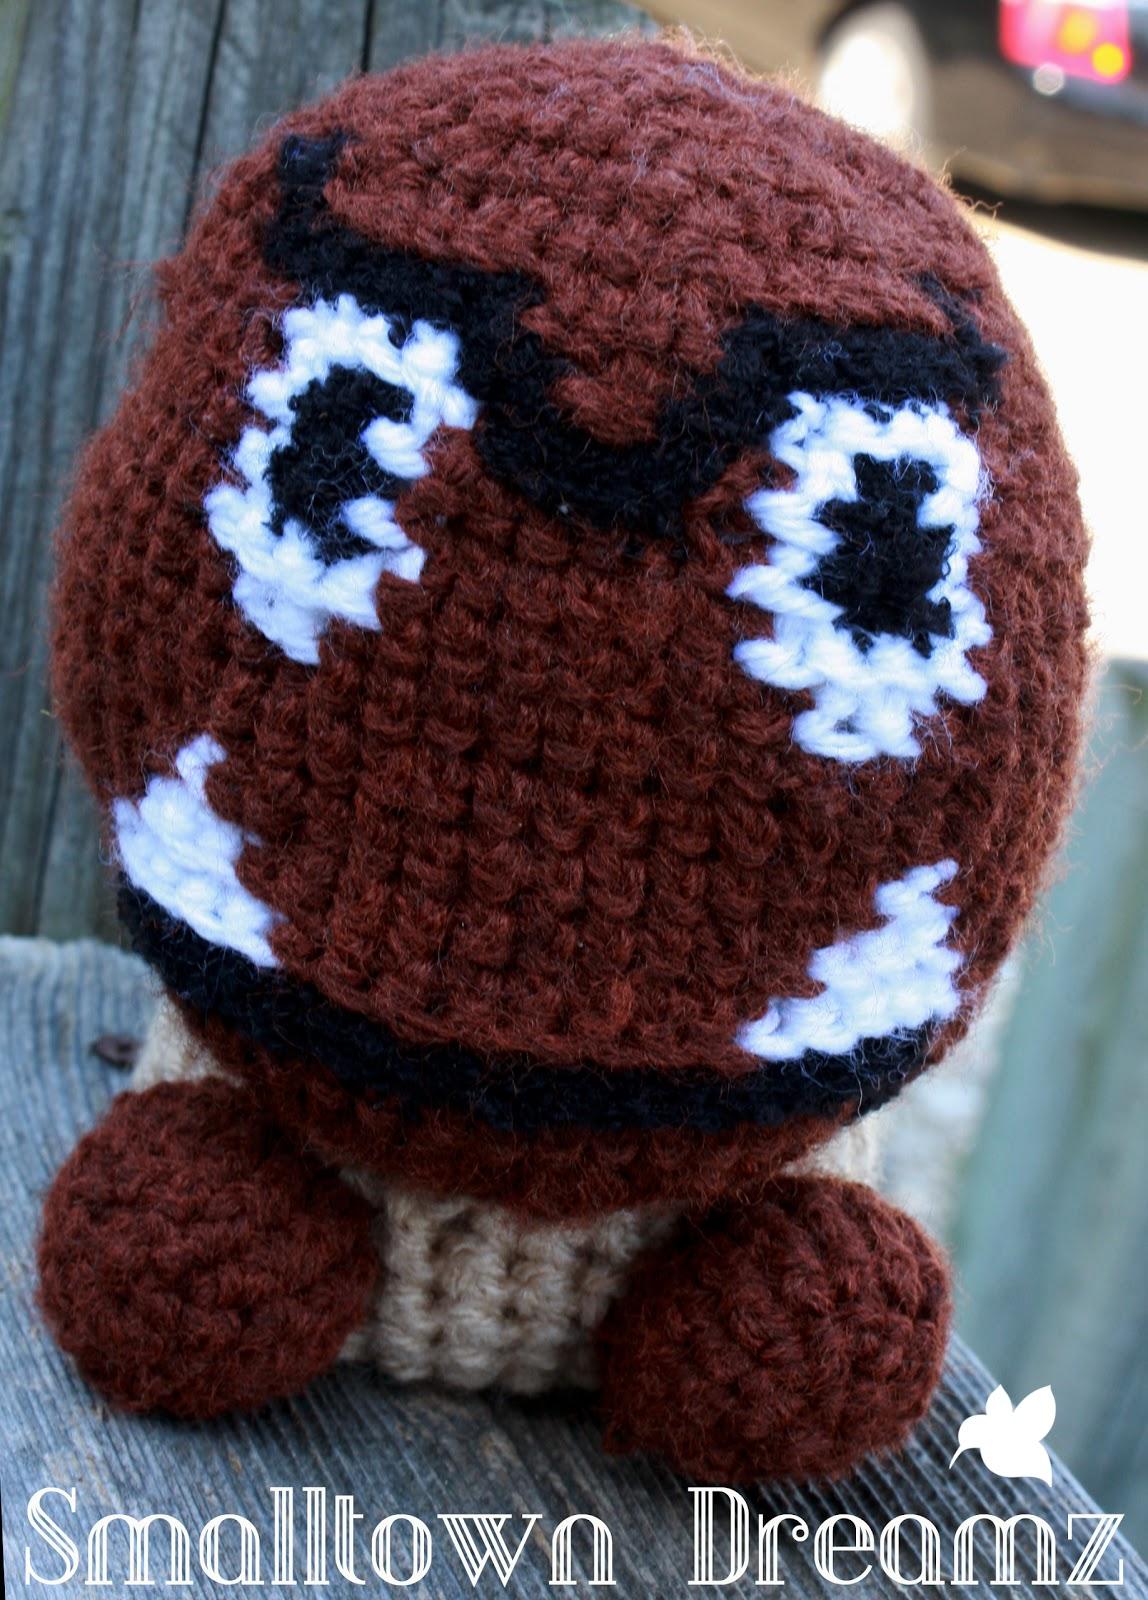 Smalltown Dreamz: Mario Inspired Goomba Crochet Pattern